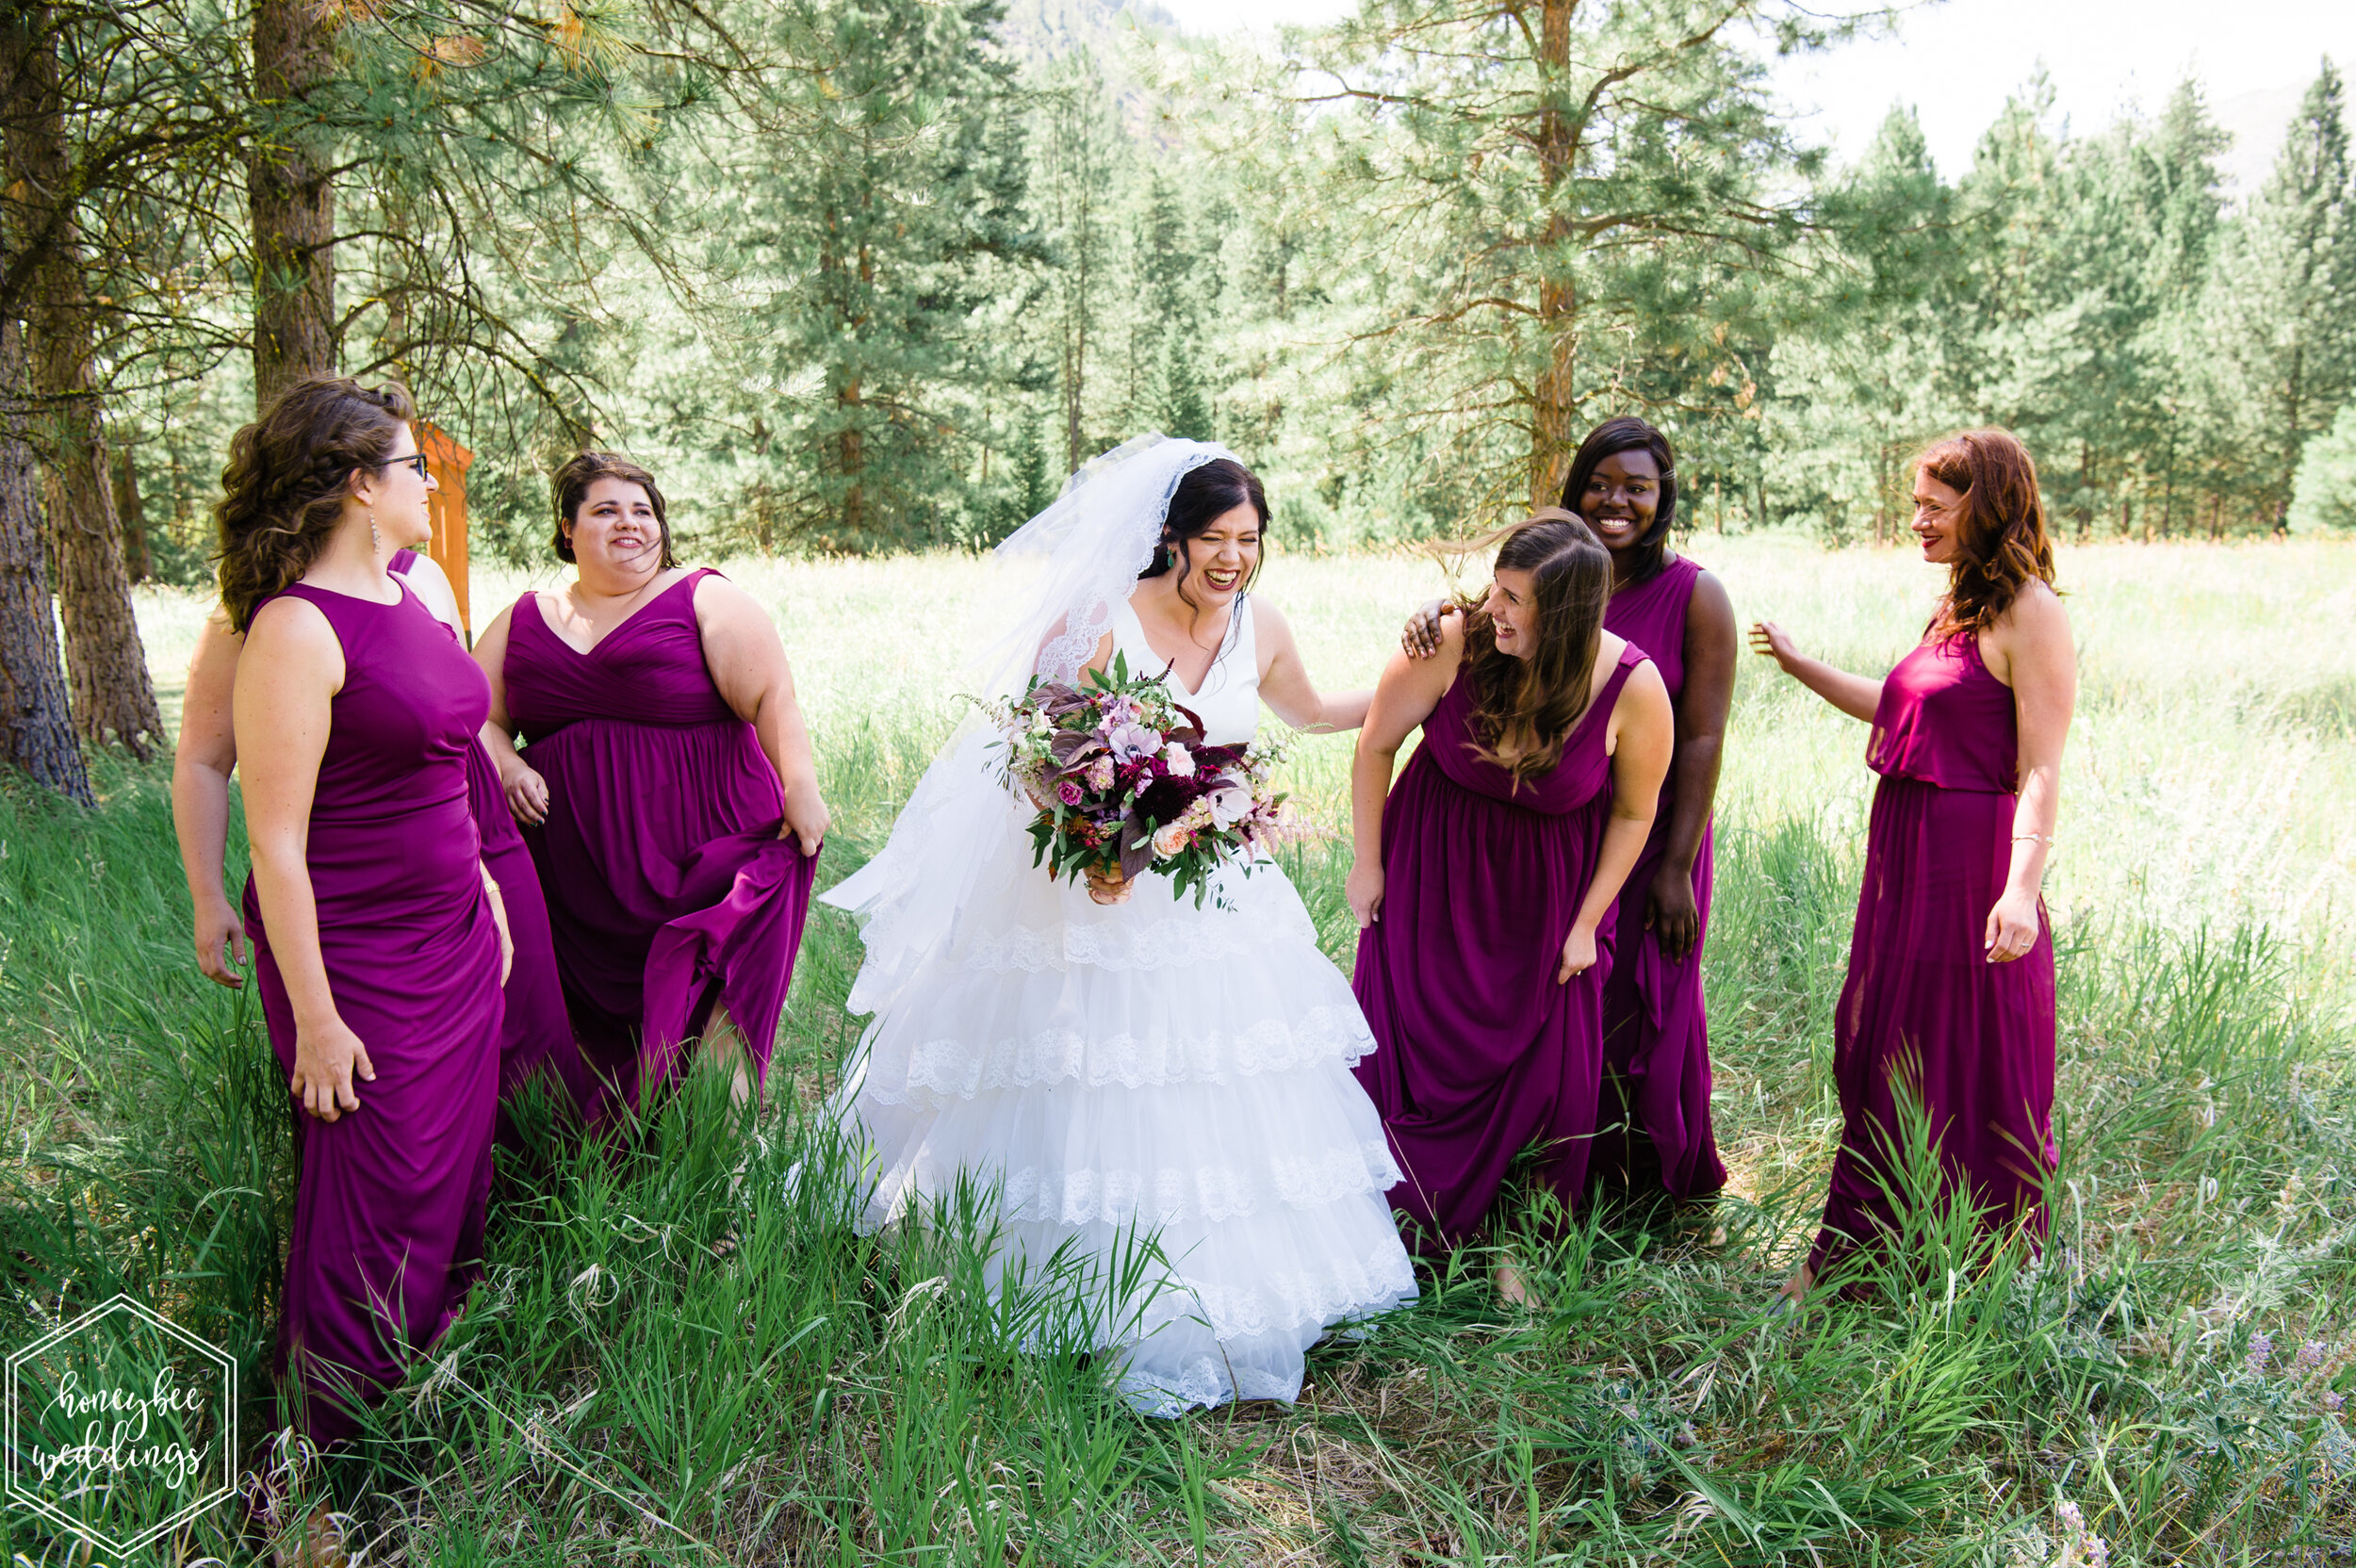 029White Raven Wedding_Montana Wedding Photographer_Rebekah & Likom_Honeybee Weddings_July 27, 2019-981.jpg